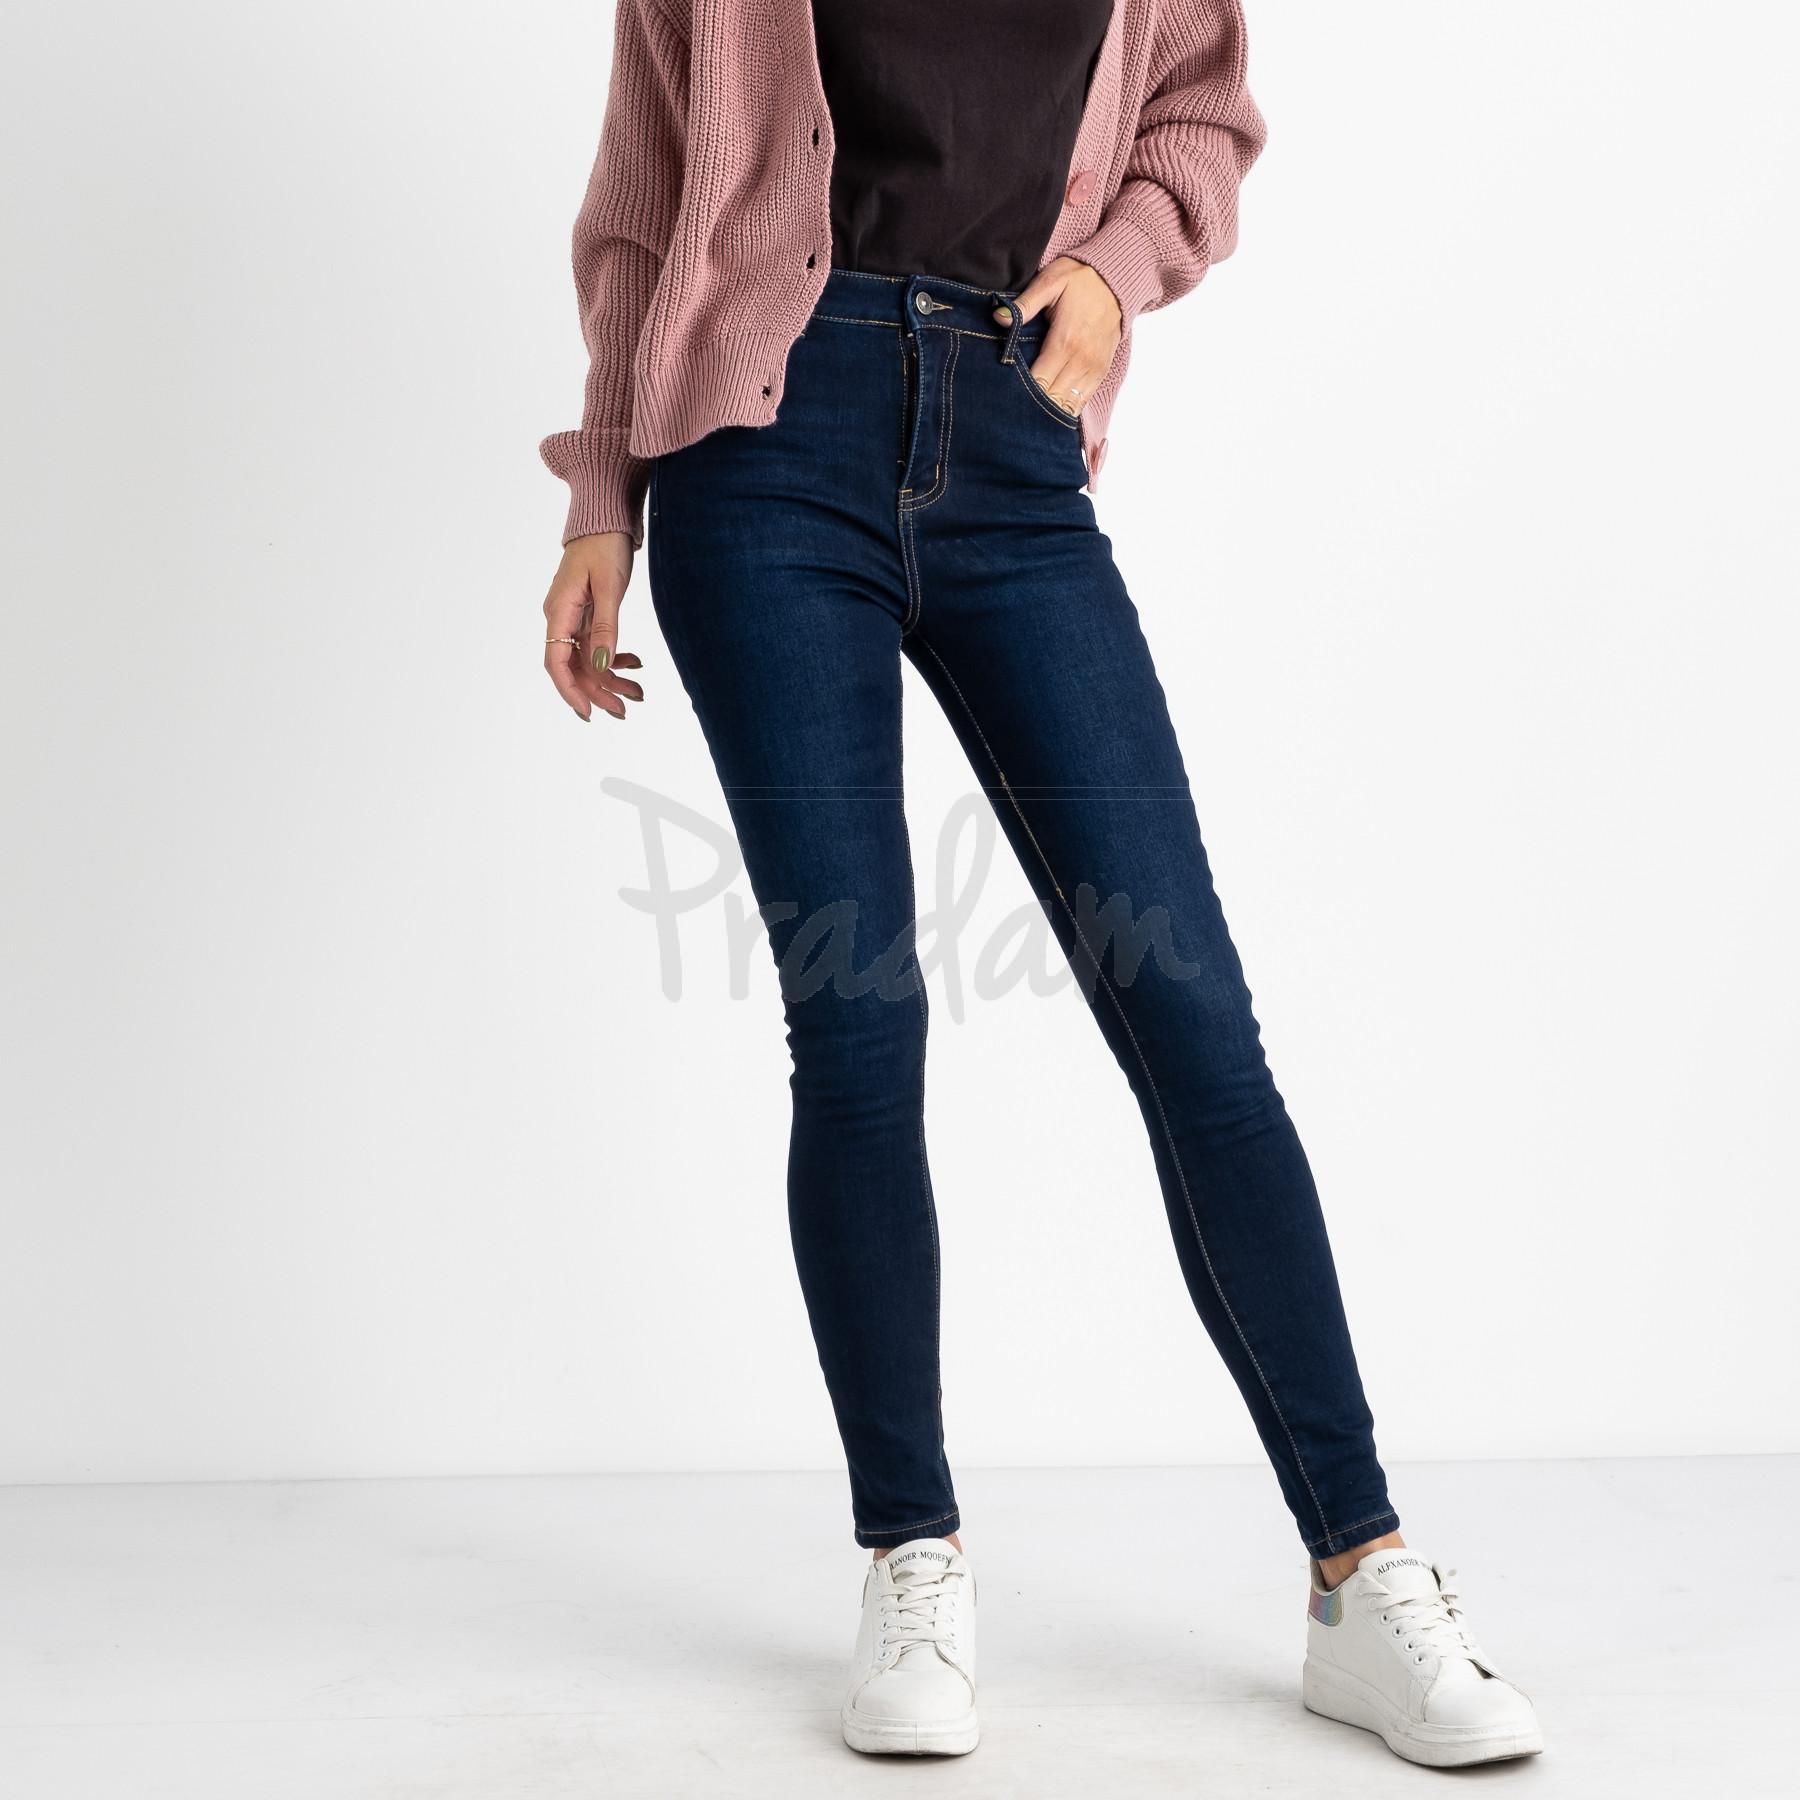 6044 New Jeans американка синяя стрейчевая на байке (6 ед.размеры: 25.26.27.28.29.30)